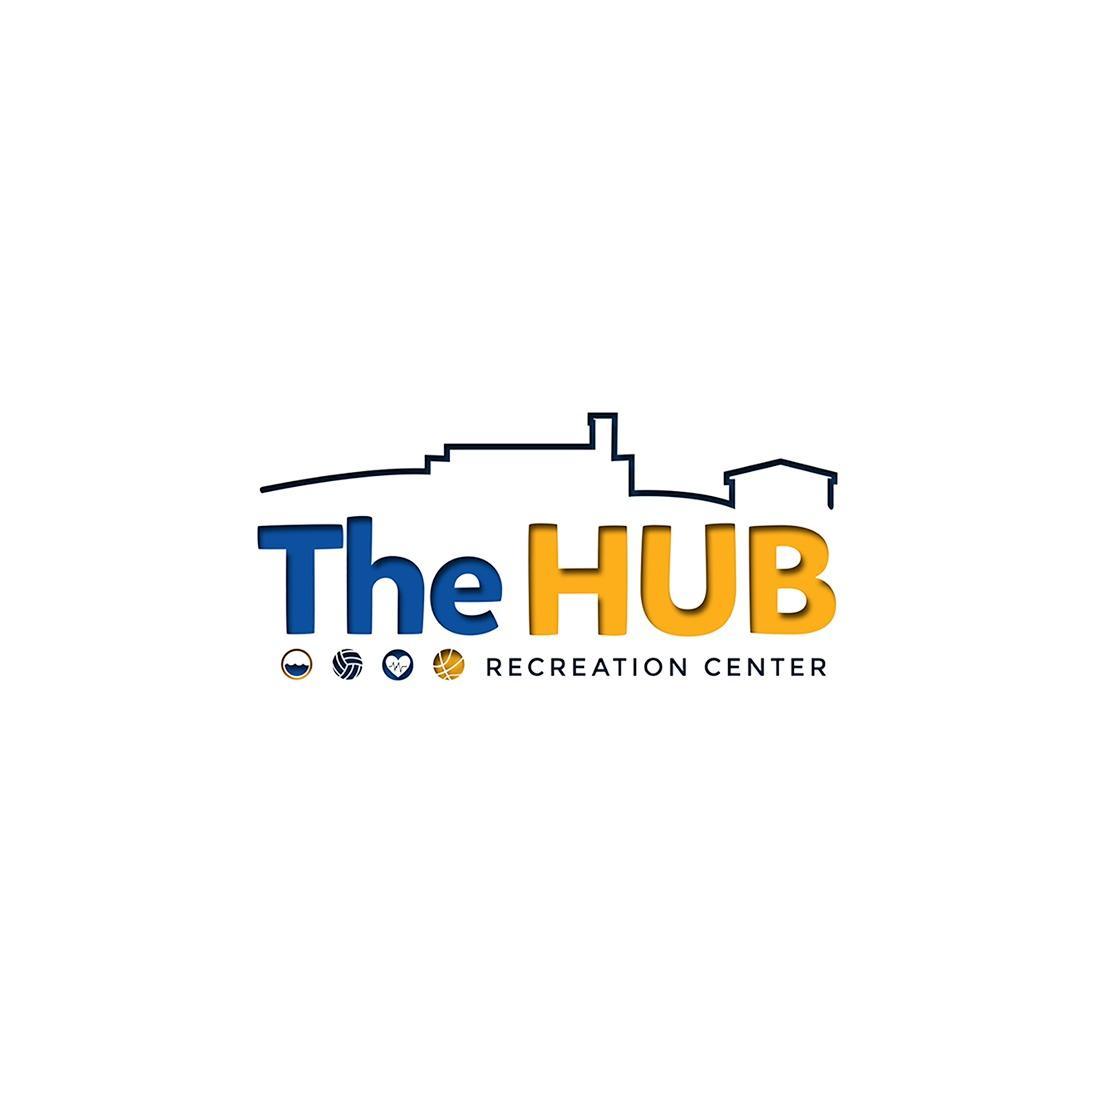 The Hub Recreation Center